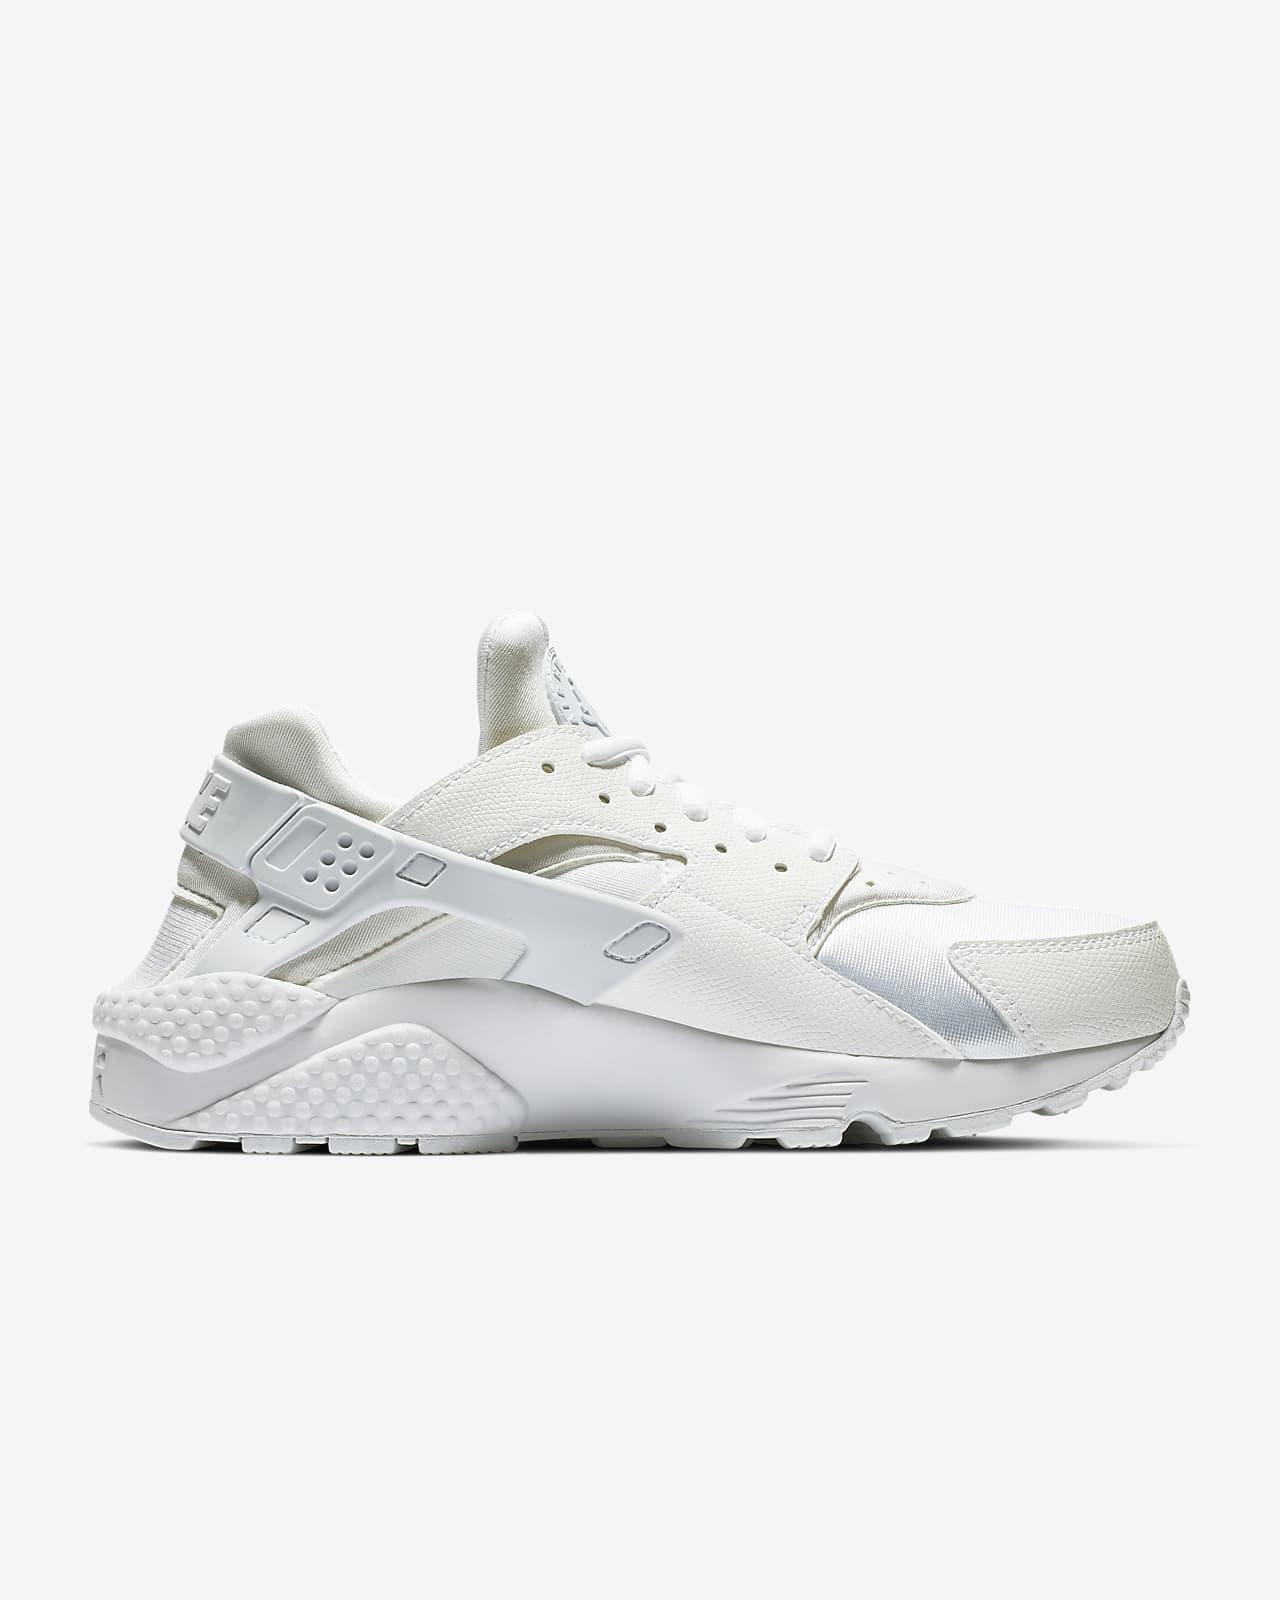 Sinceramente Infectar Anticuado  Nike Air Huarache Women's Shoe. Nike PH